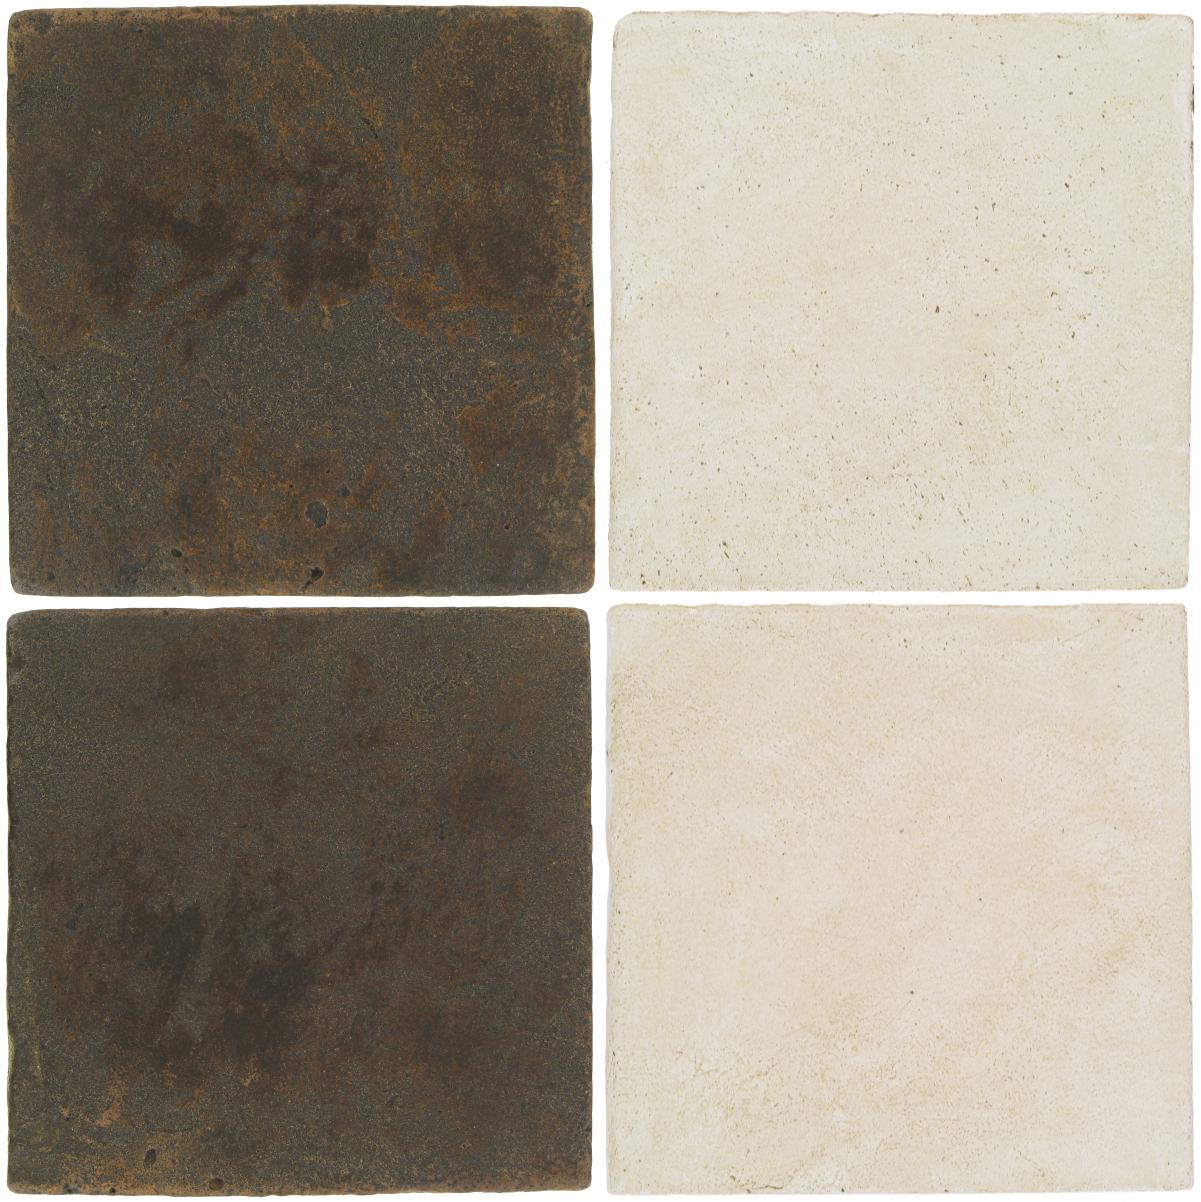 Pedralbes Antique Terracotta  2 Color Combinations  VTG-PSCO Cologne Brown + OHS-PGAW Antique White